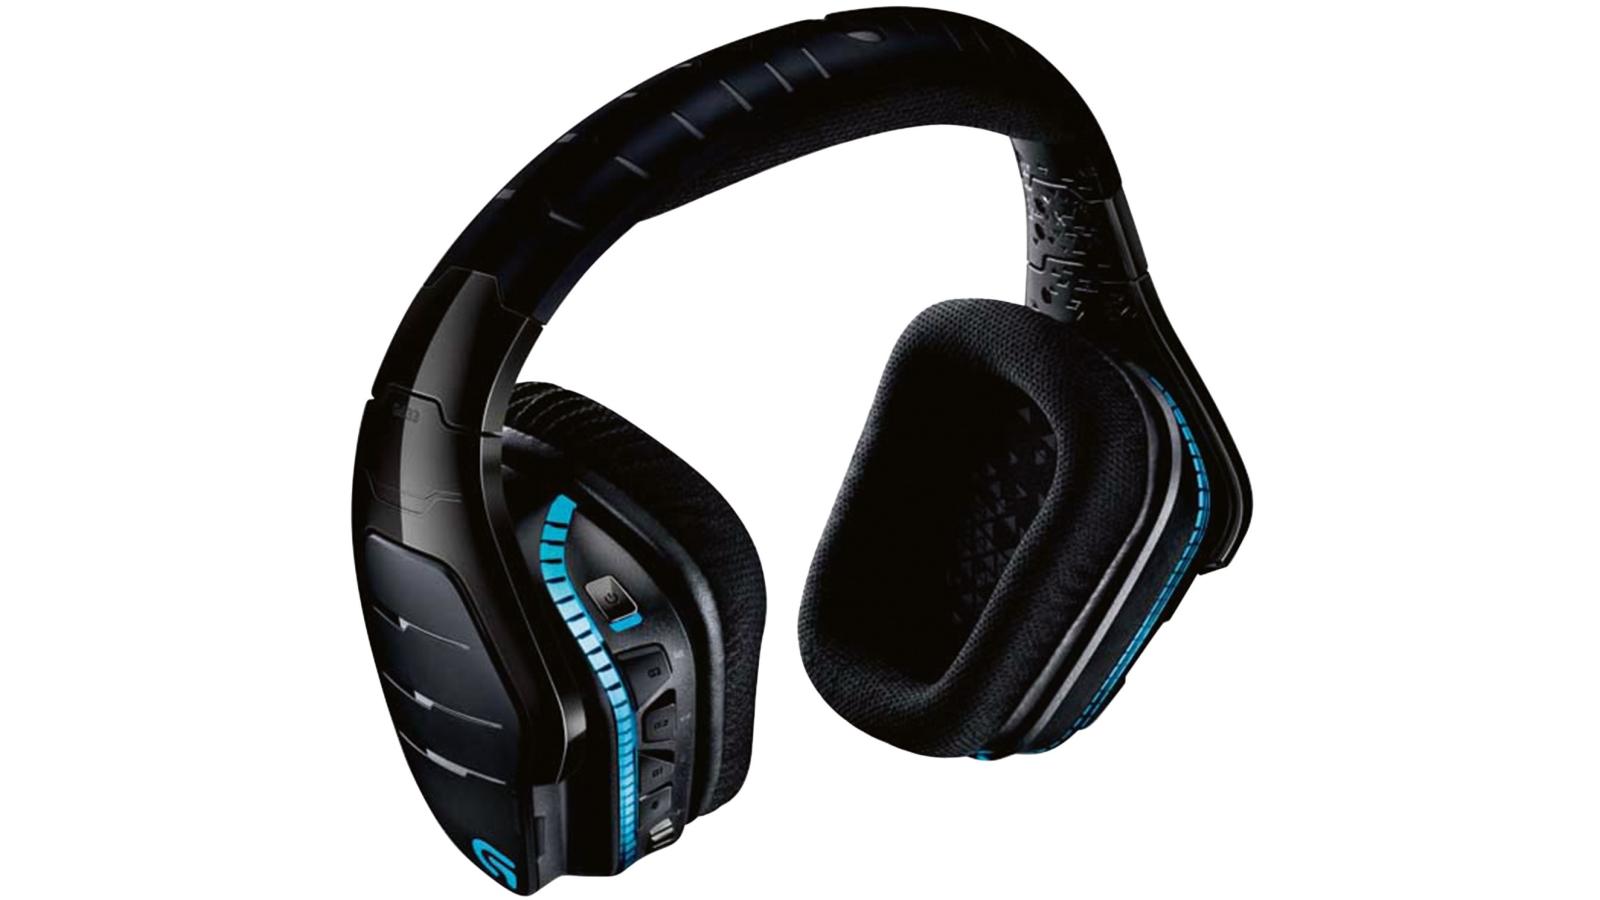 Logitech G933 Artemis Spectrum Wireless Gaming Headset - Black